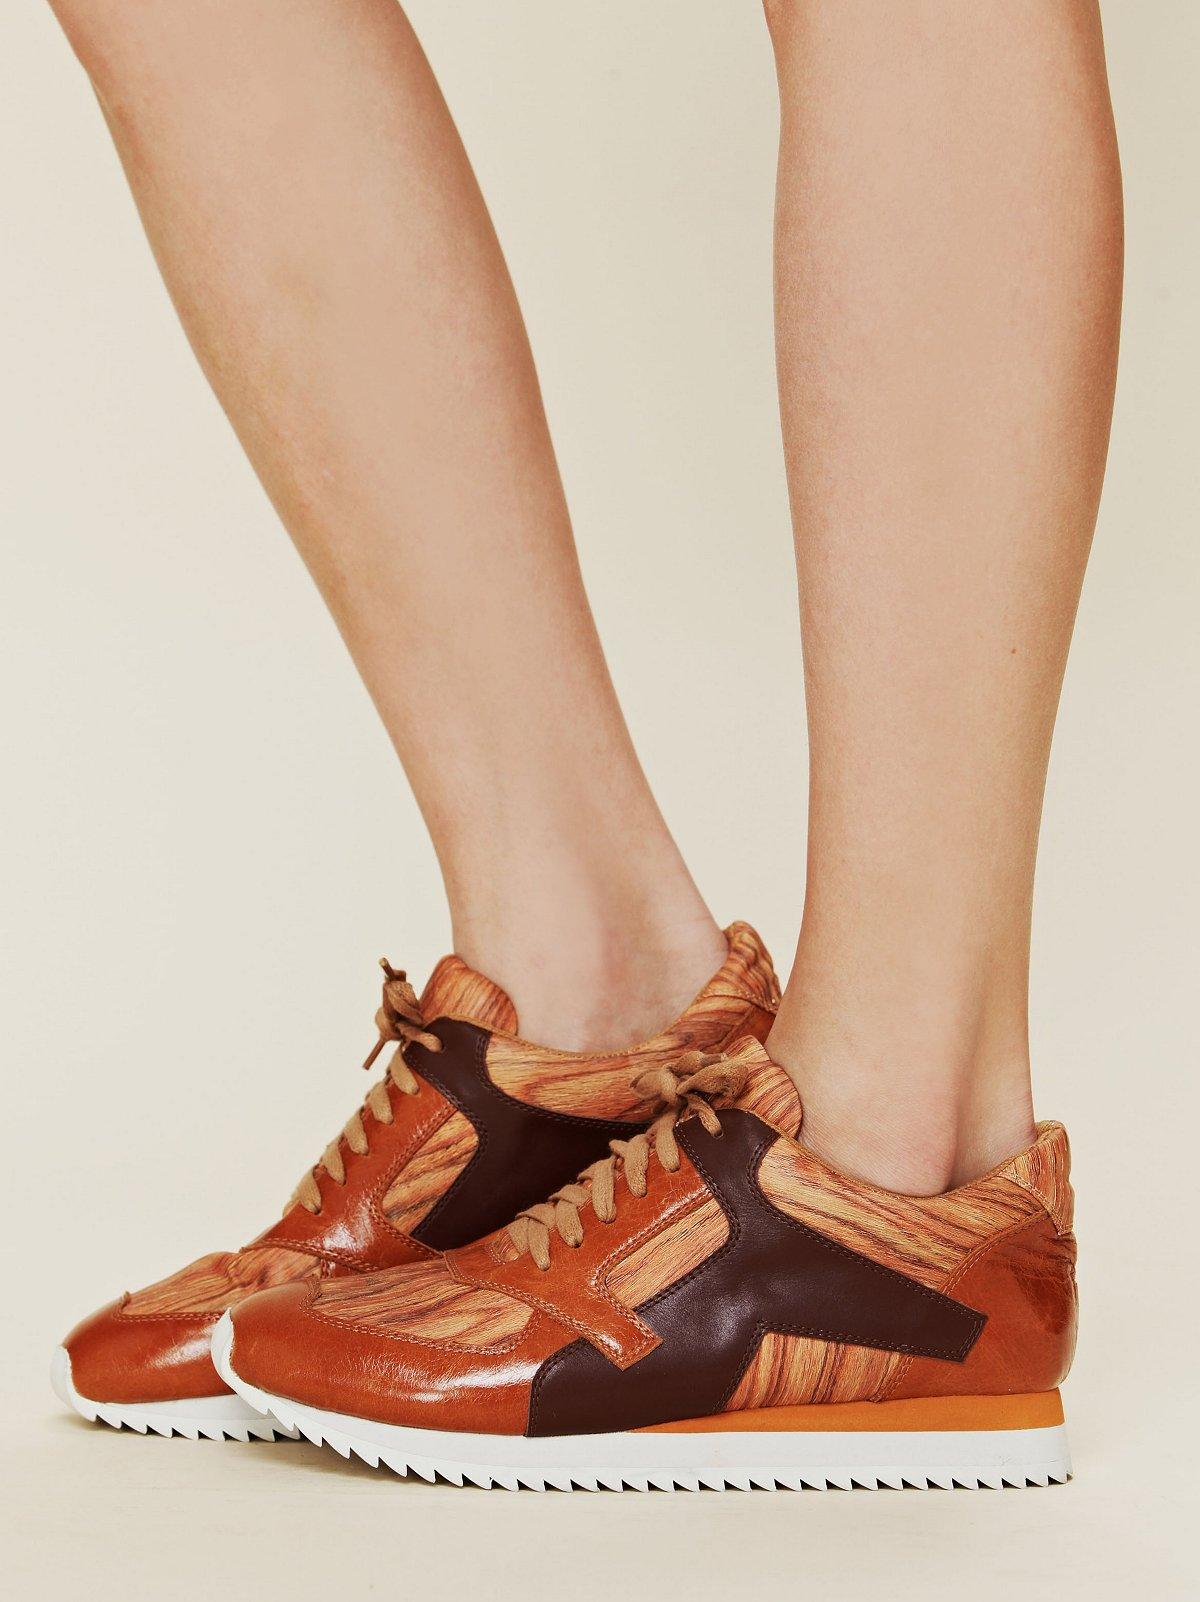 Kurtwood Sneaker